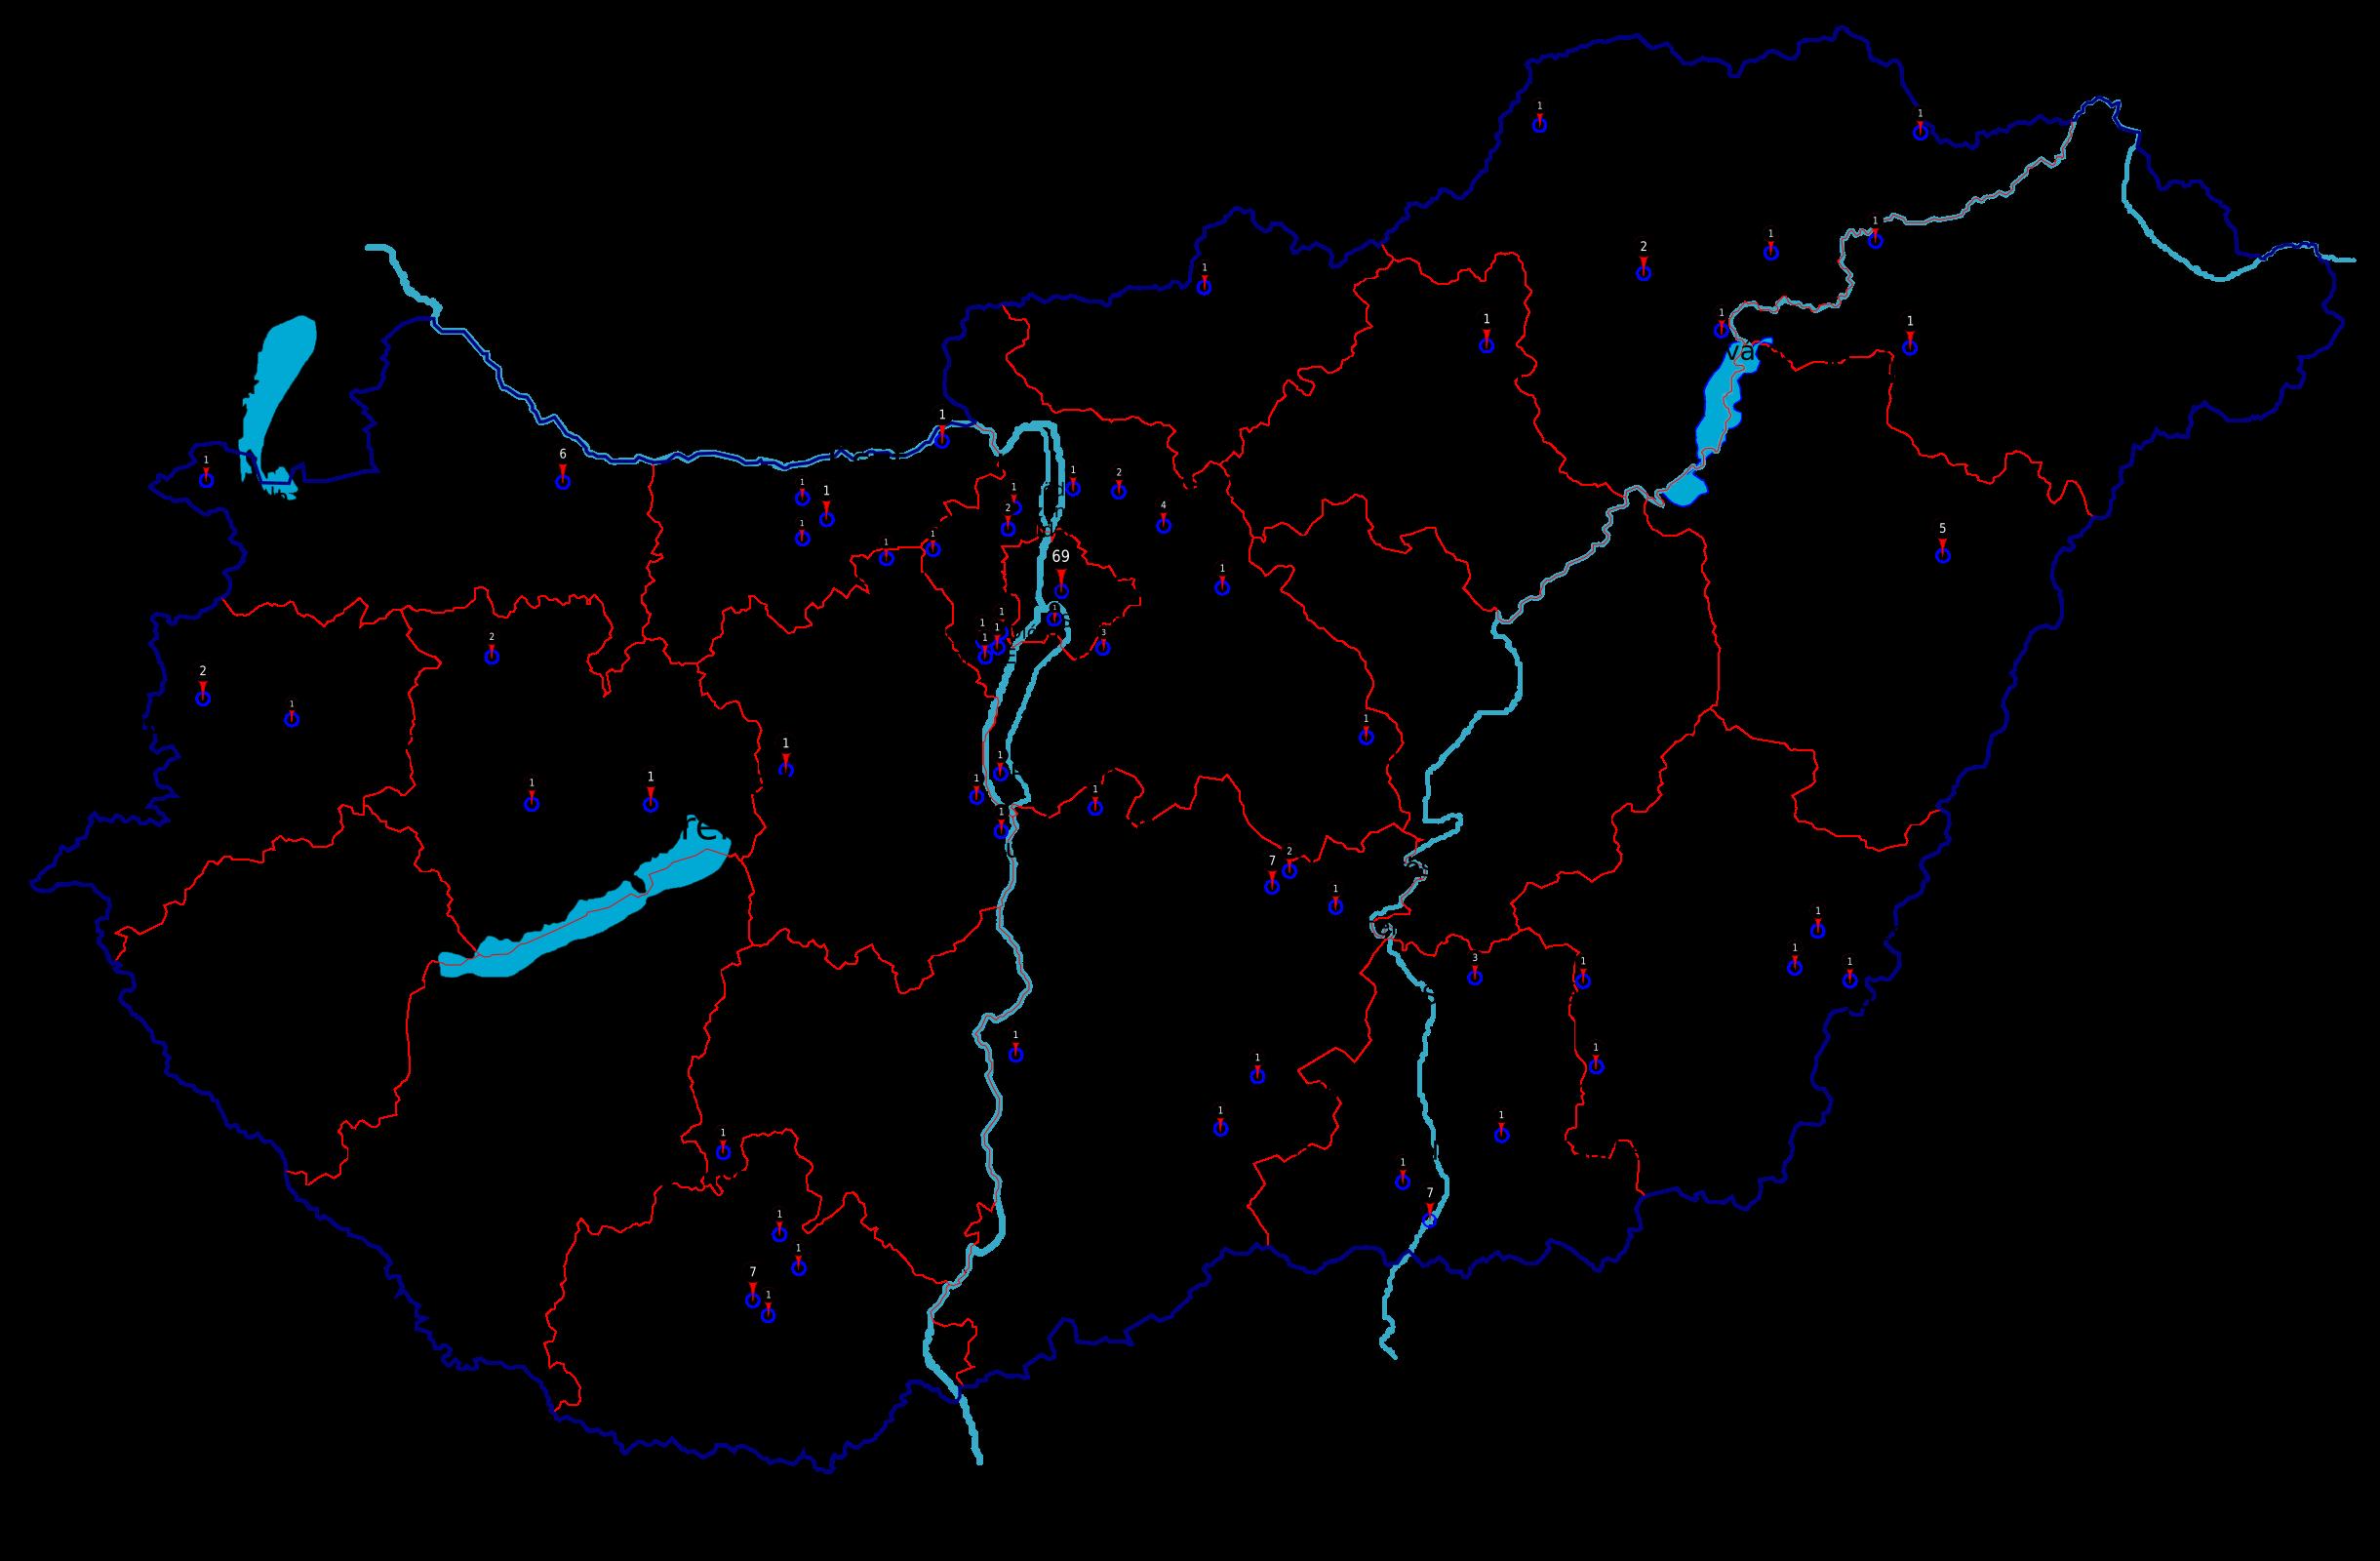 Hungary_blindmap_Pinned